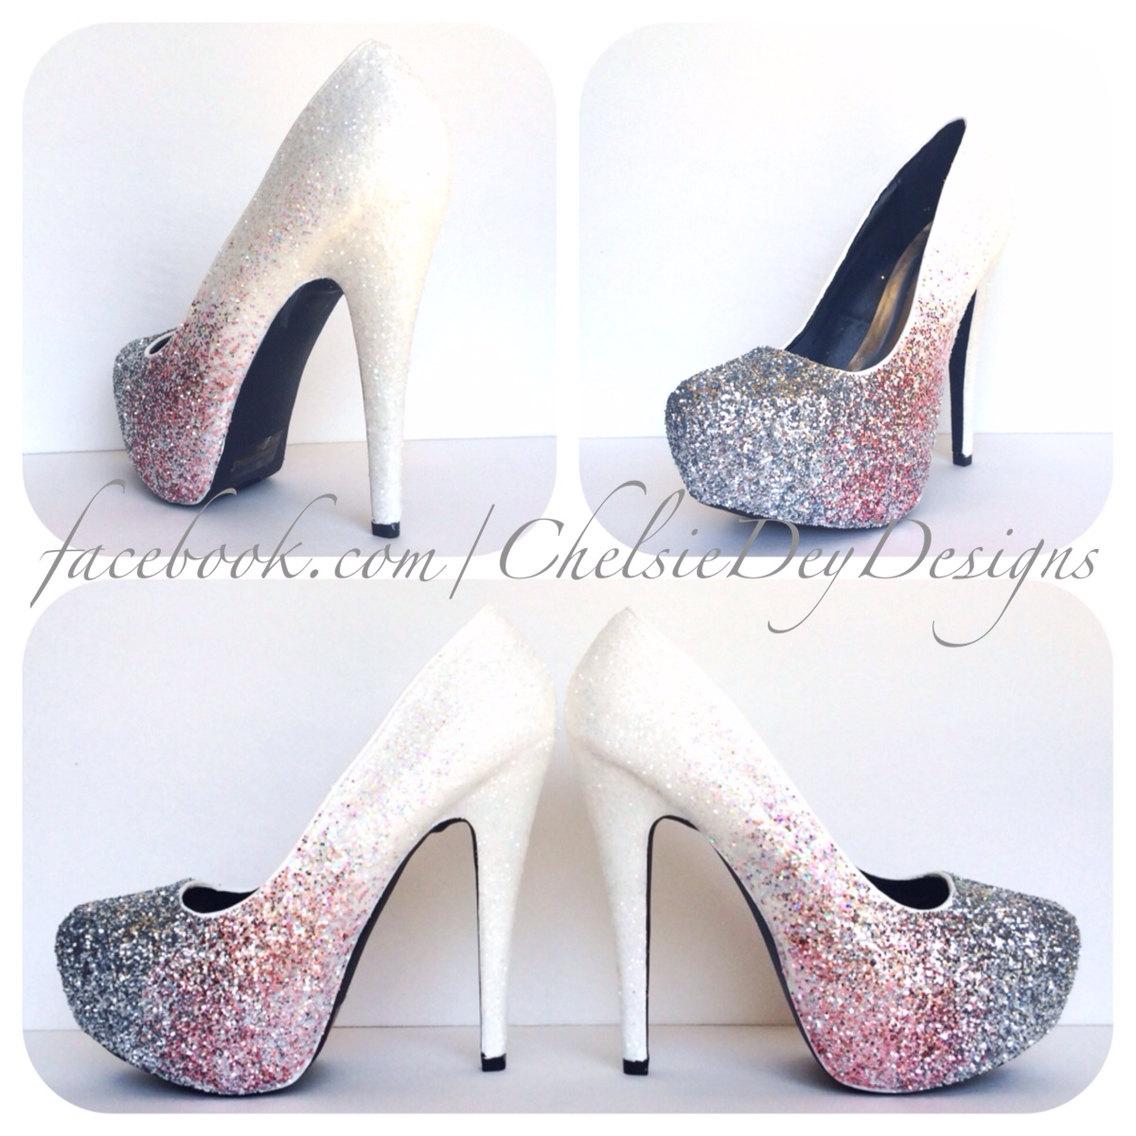 White Glitter Ombre High Heels - Pink Silver Fade Pumps - Platform ...